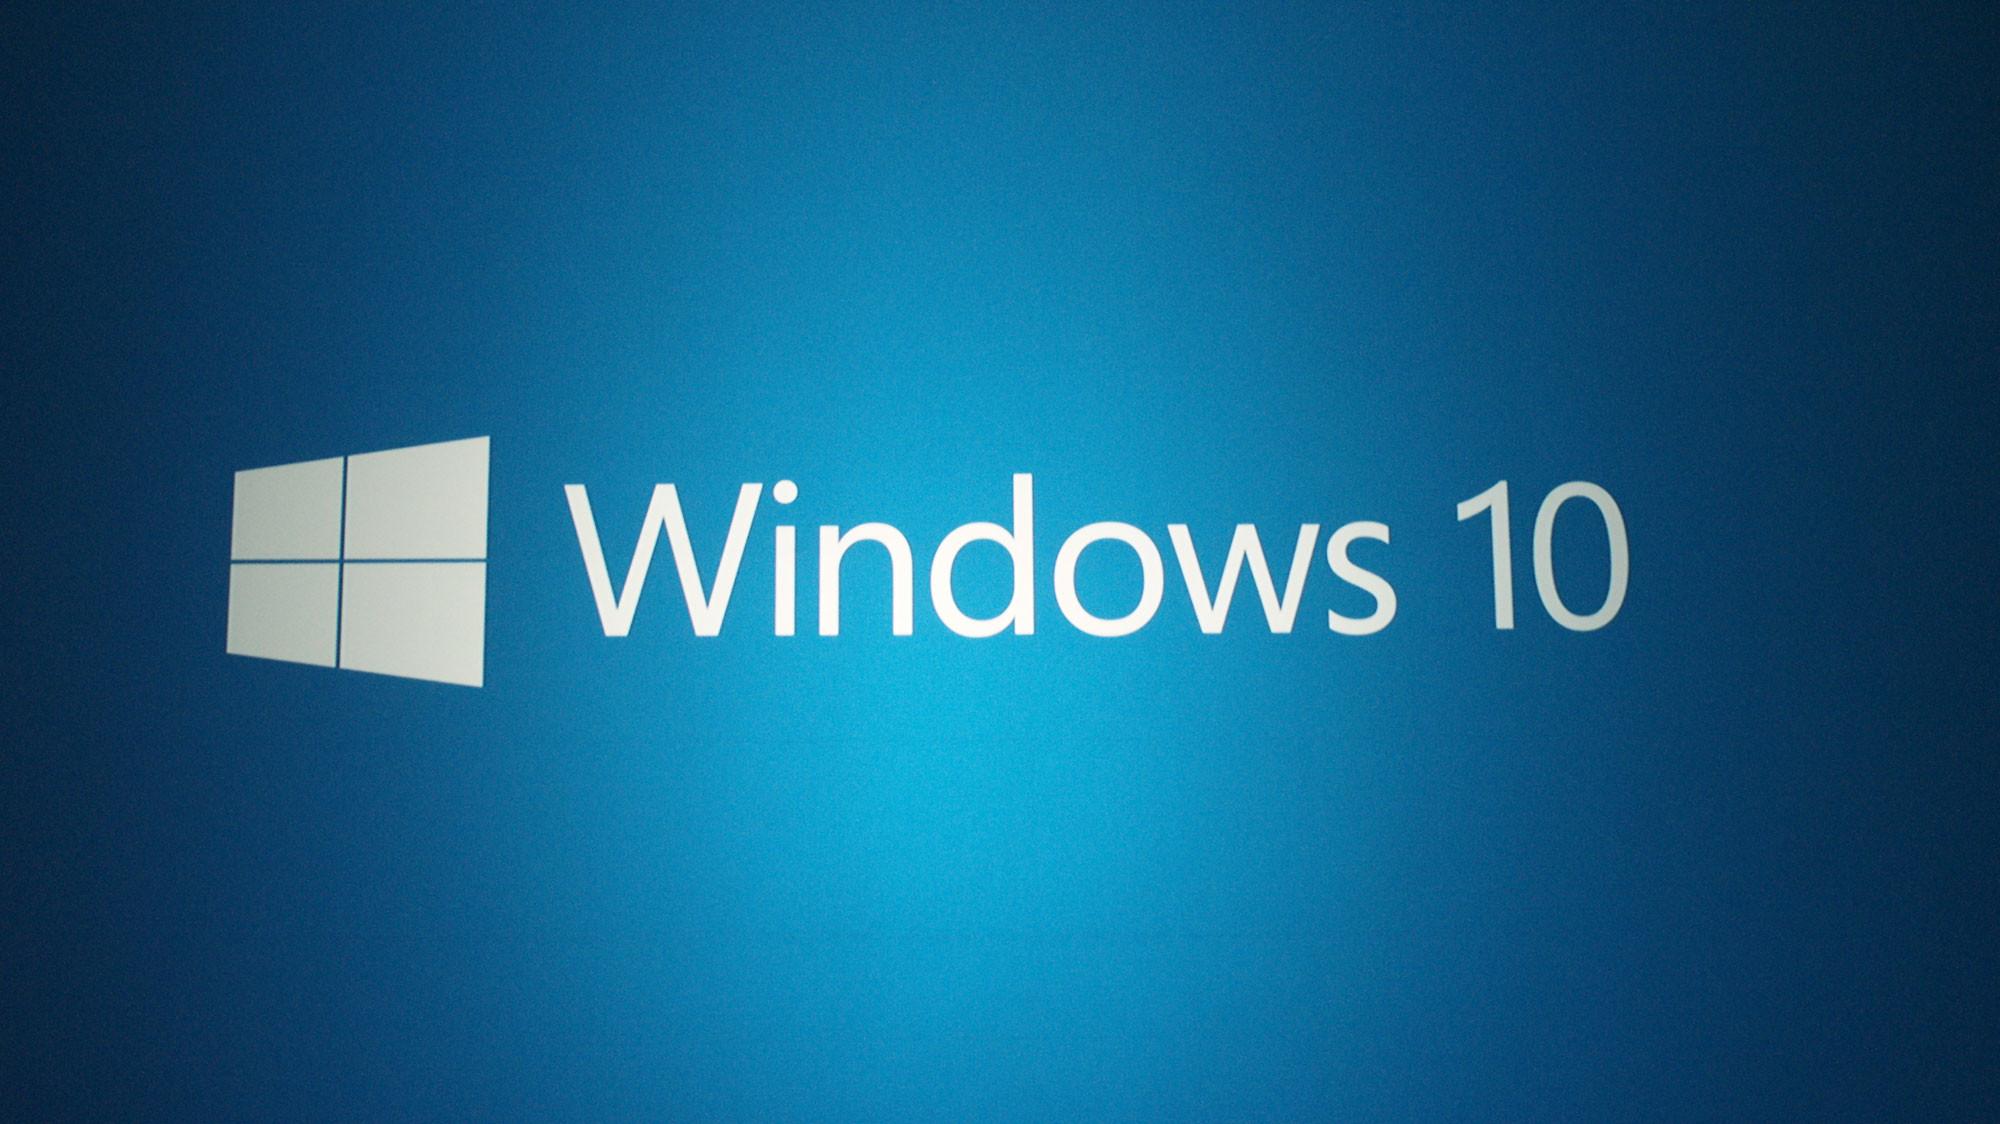 Windows 10 HD Wallpapers | Hd Wallpapers